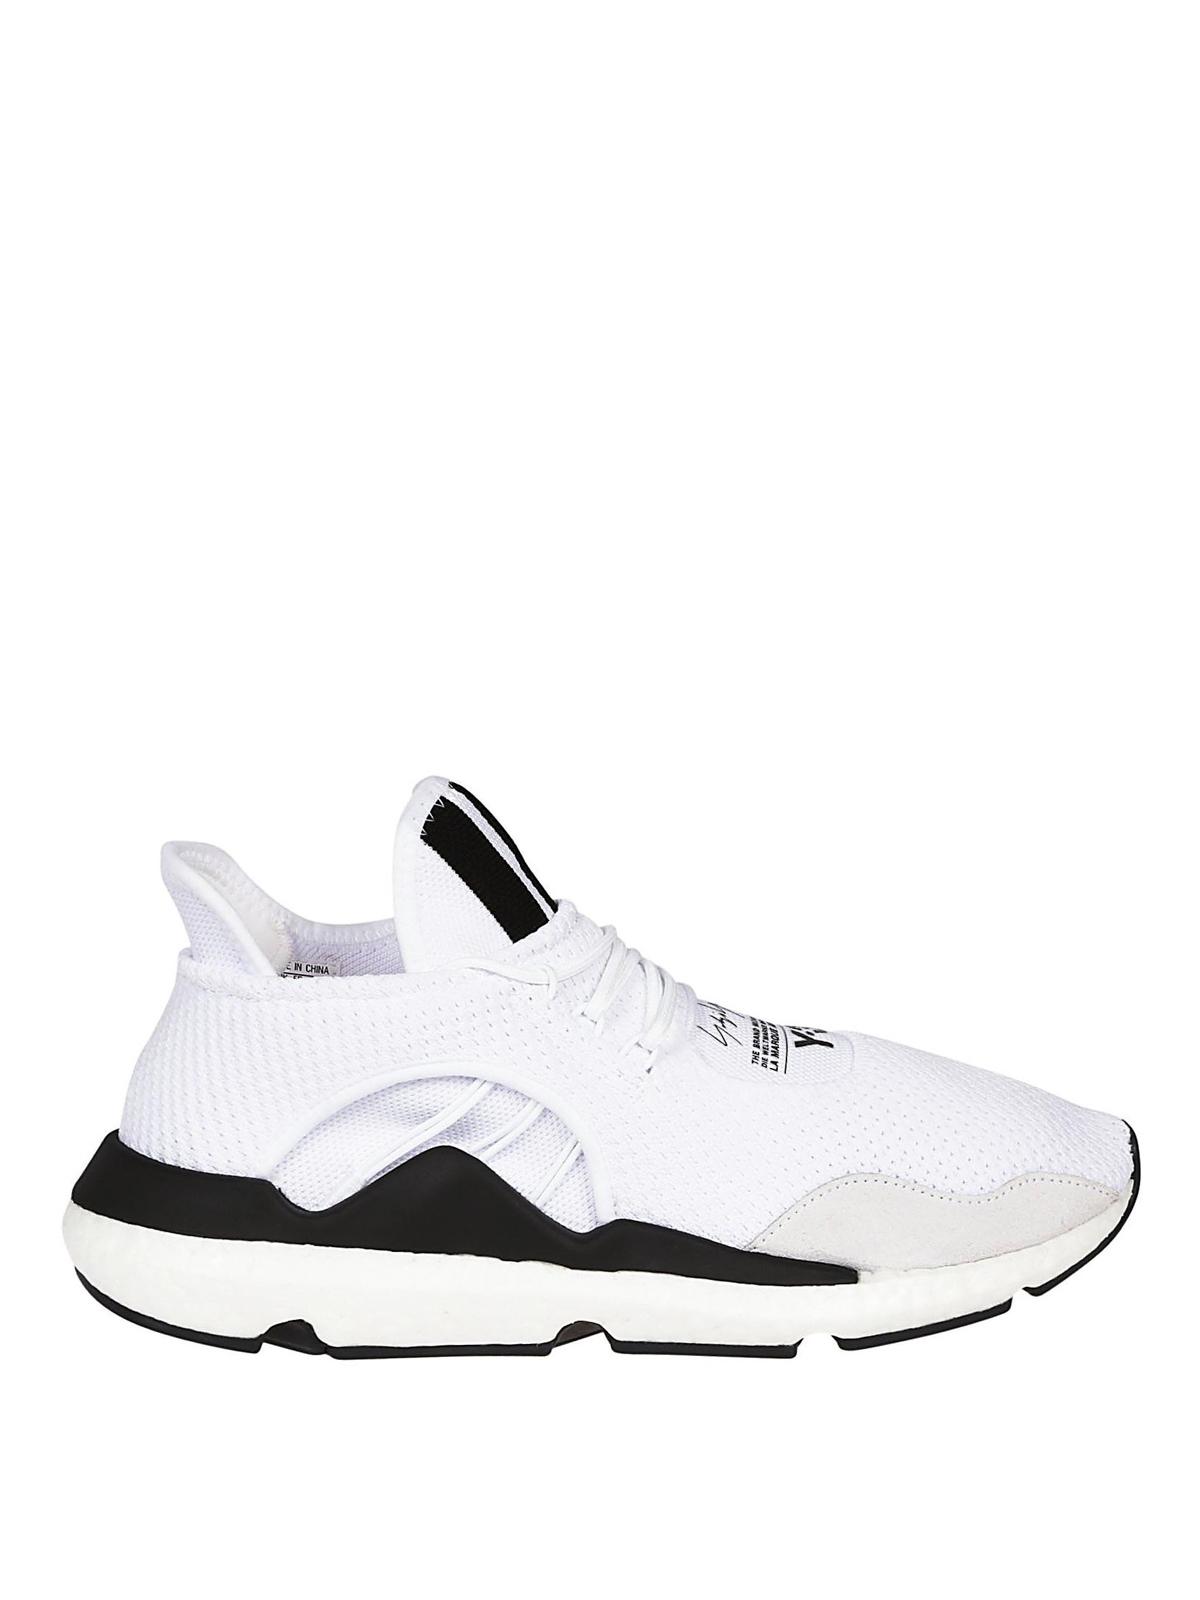 3 Adidas De Y Sport Baskets Chaussures Ac7195 Saikou 5q58UwxXnr